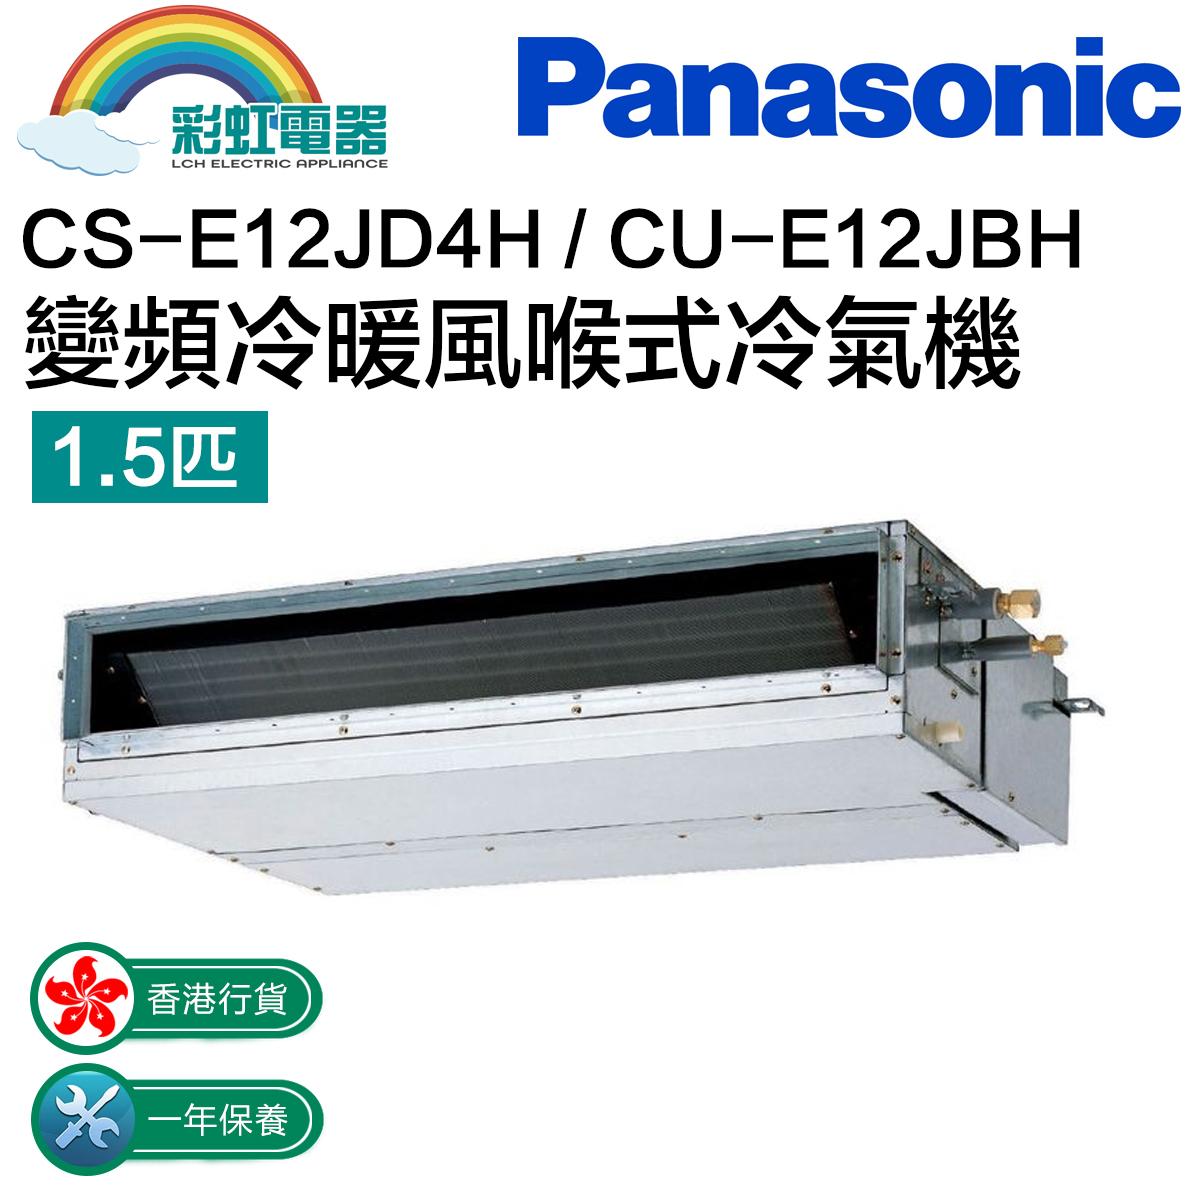 CS-E12JD4H/CU-E12JBH變頻冷暖低壓風喉式冷氣機 1.5匹